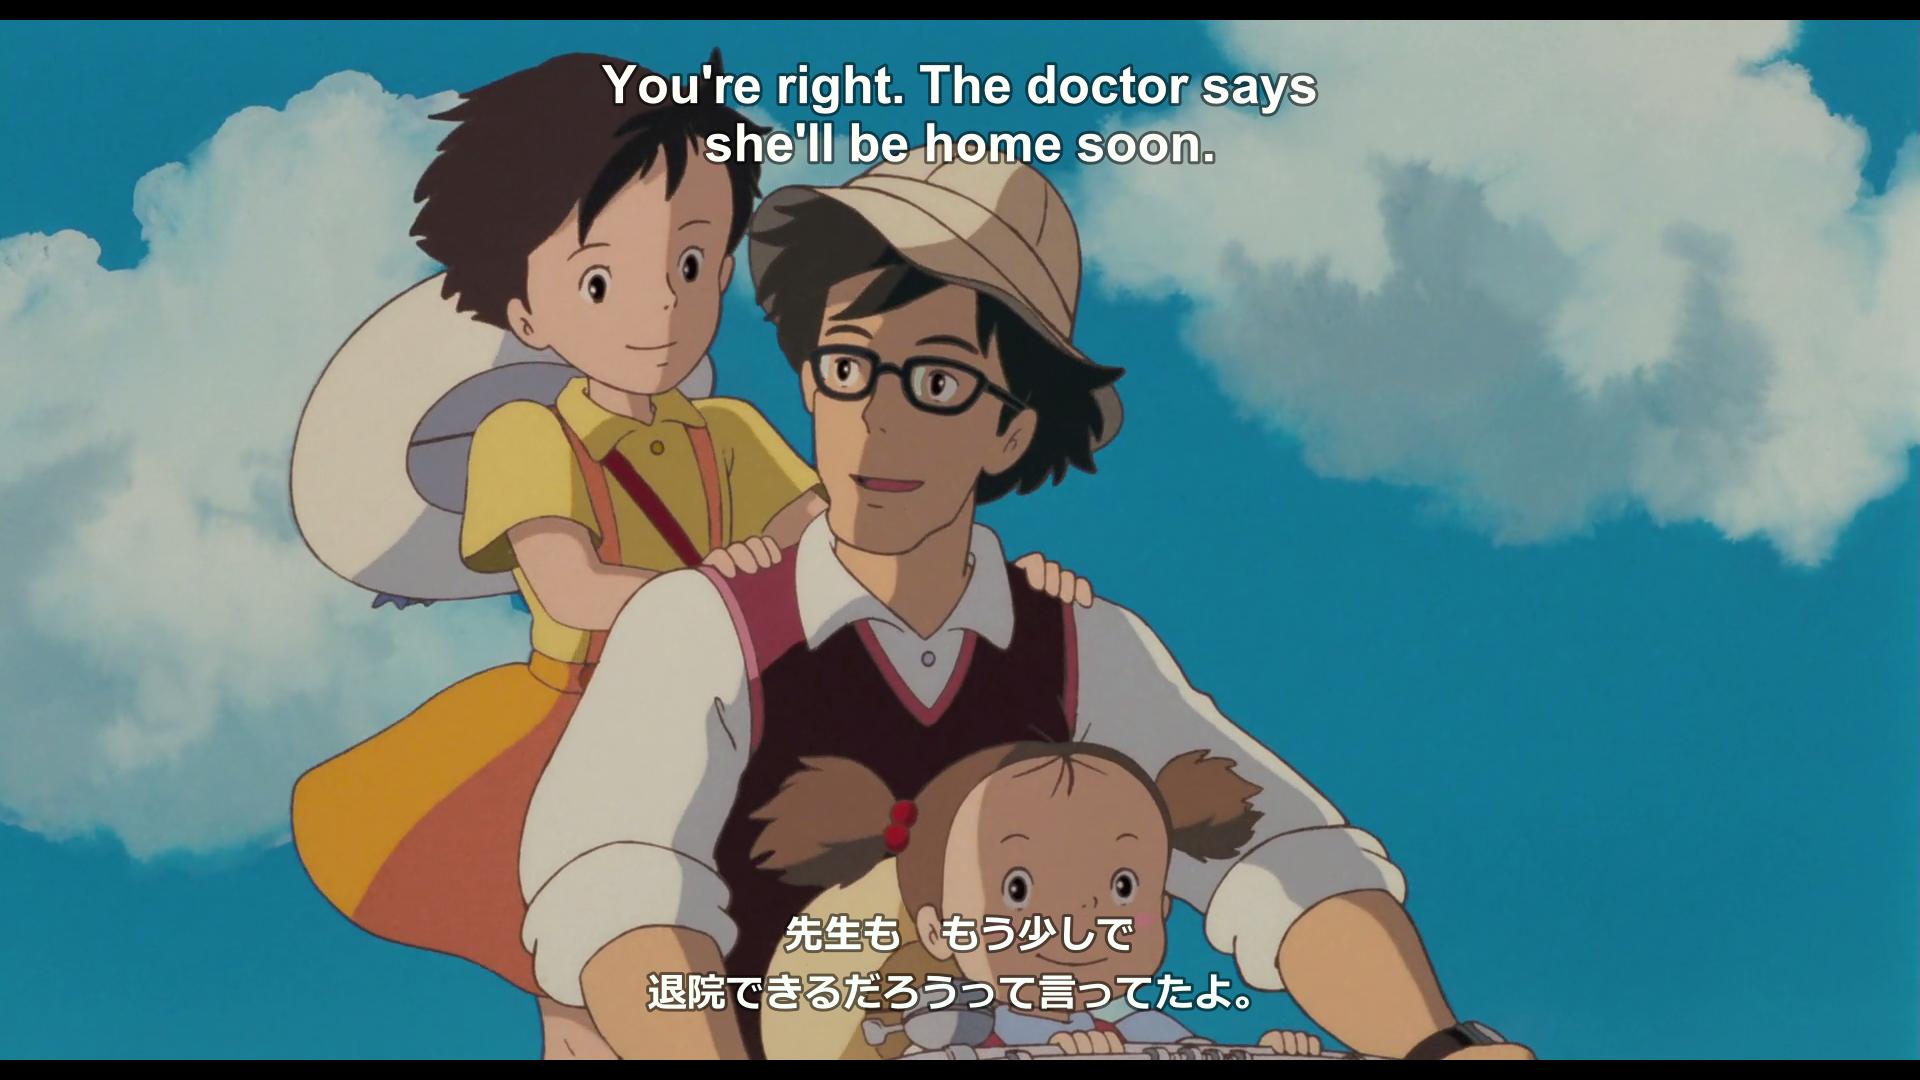 A scene from Tonari no totoro (1988) featuring custom made dual subtitles.